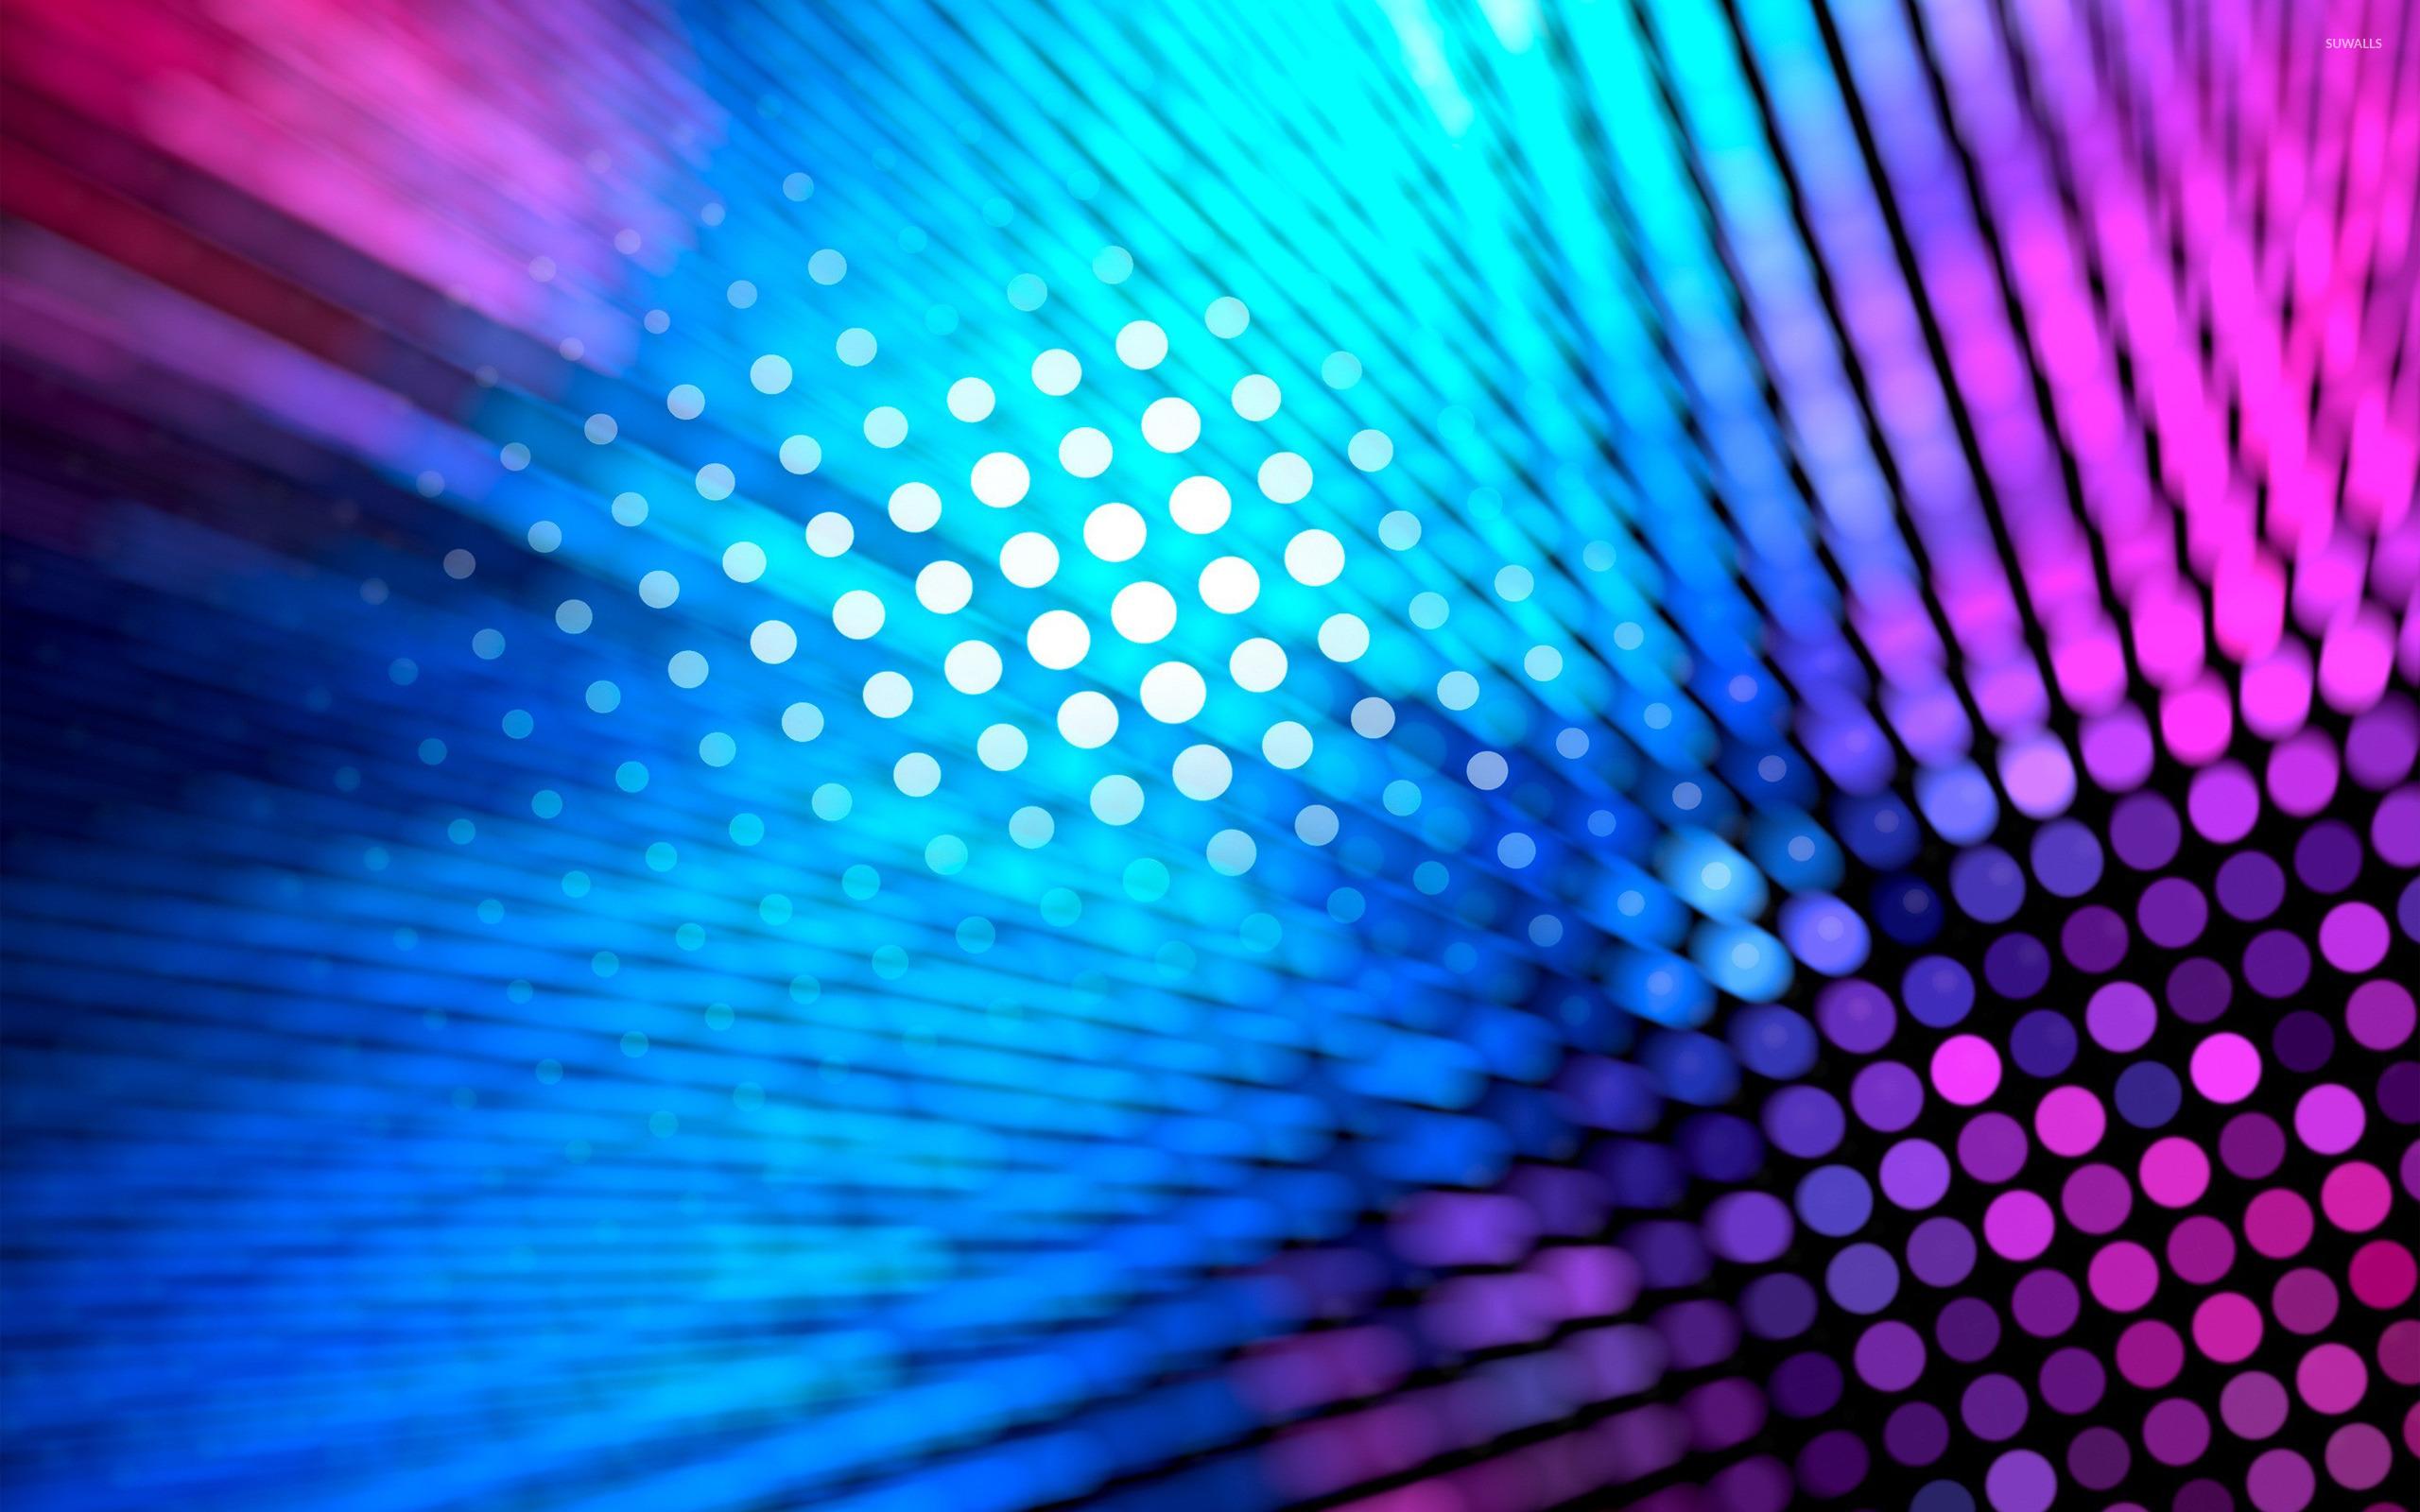 Dj 3d Wallpaper Free Download Dot Backgrounds Pixelstalk Net